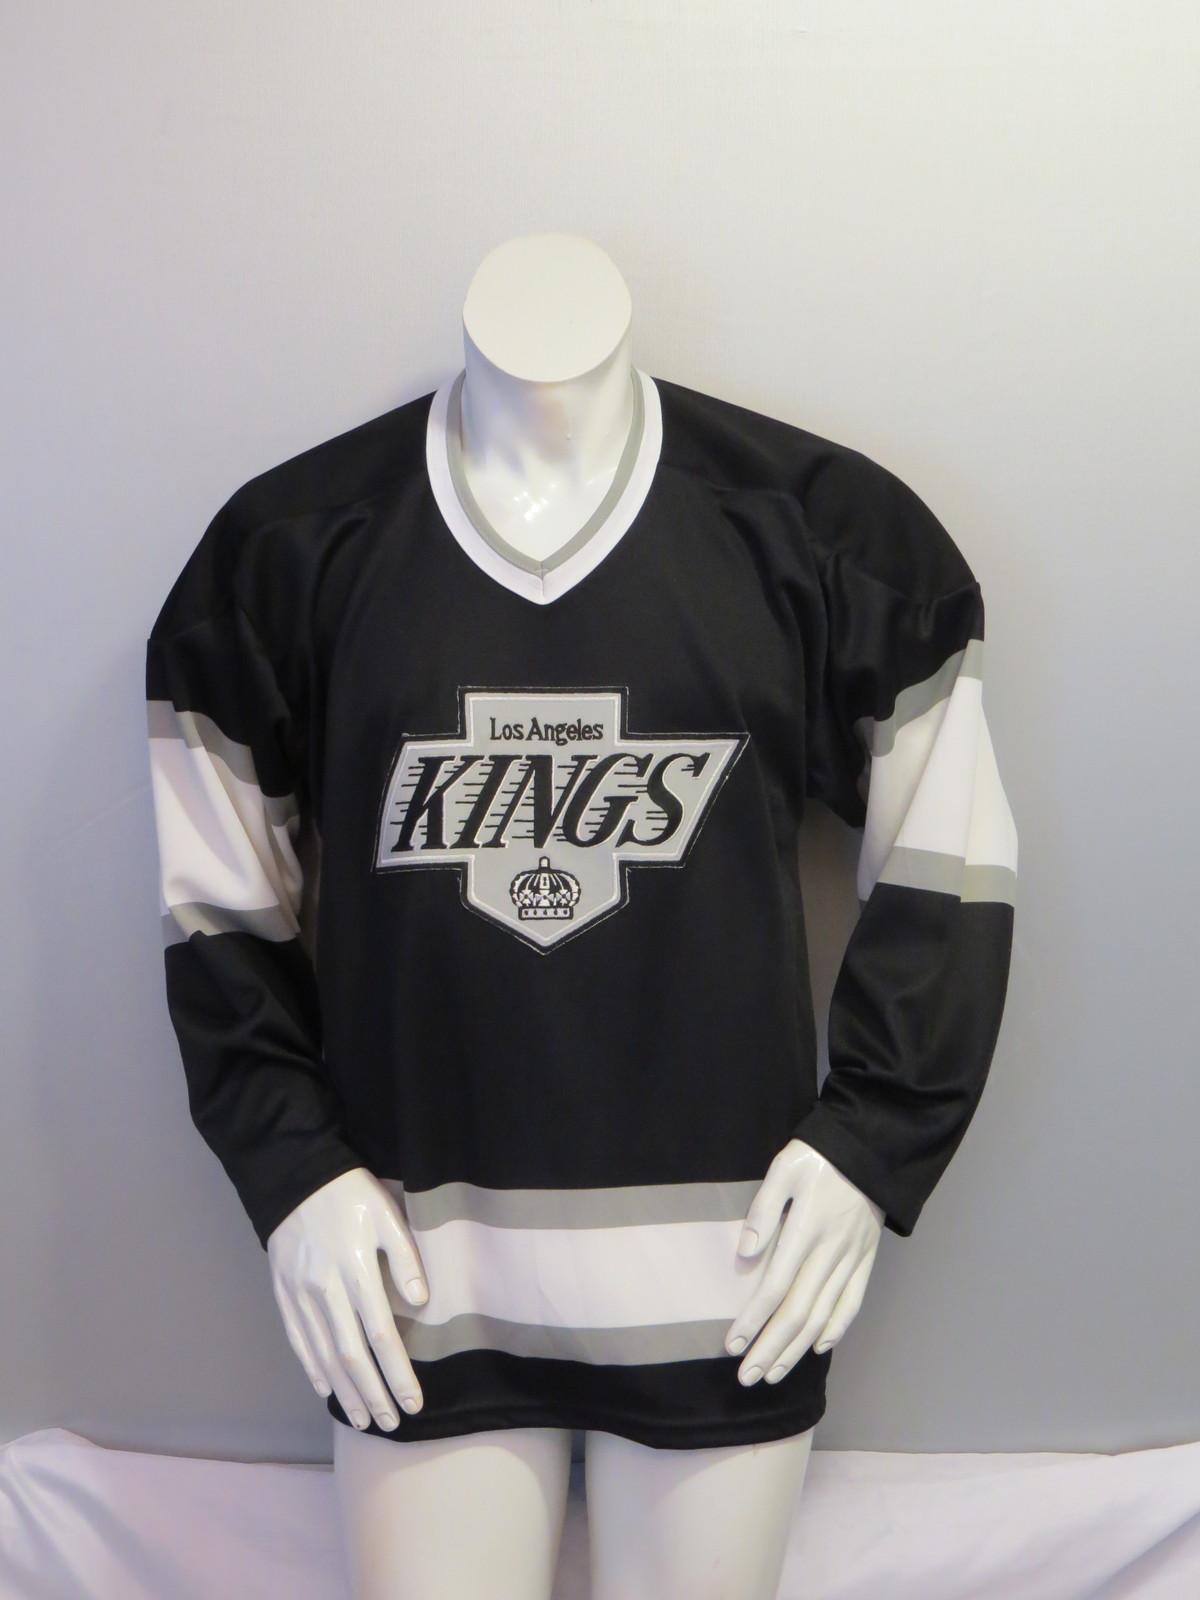 Vintage LA Kings Jersey - Away Black by CCM - Men's Medium